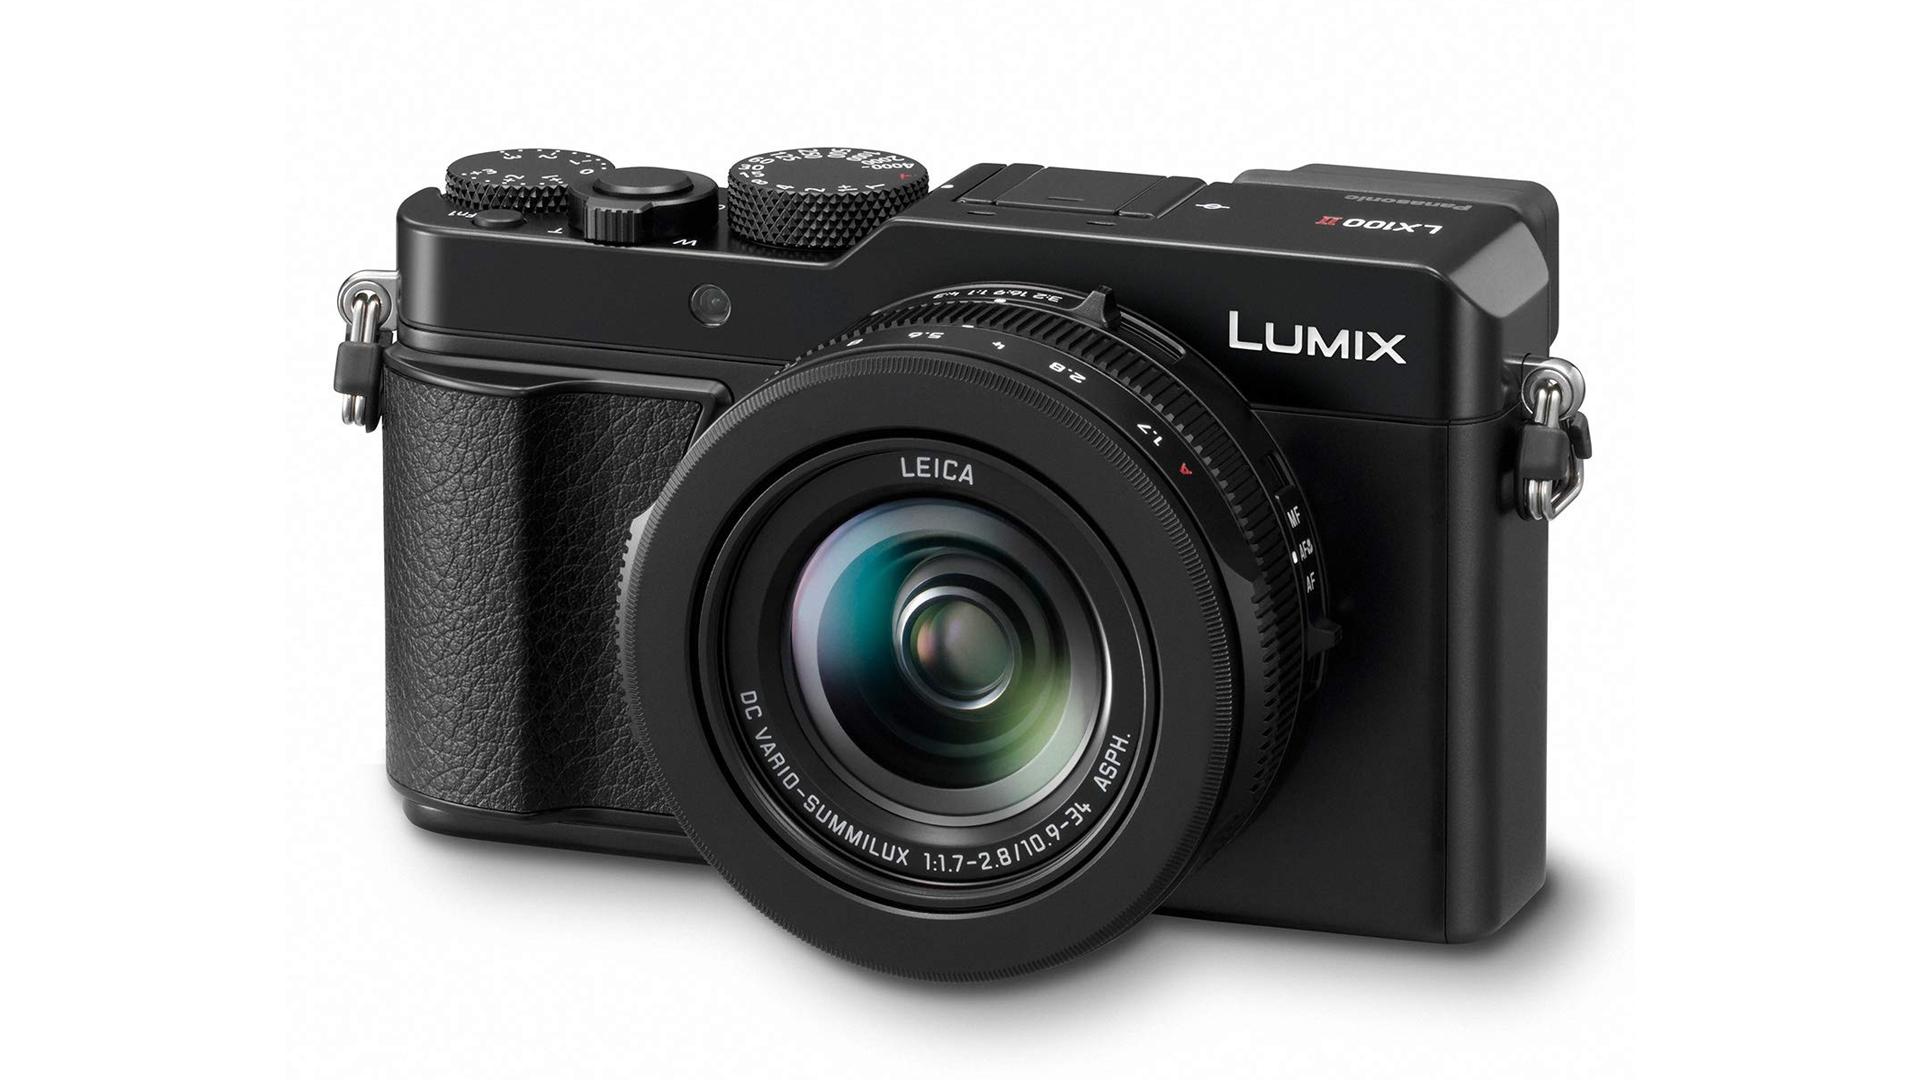 The Panasonic Lumix LX100 II